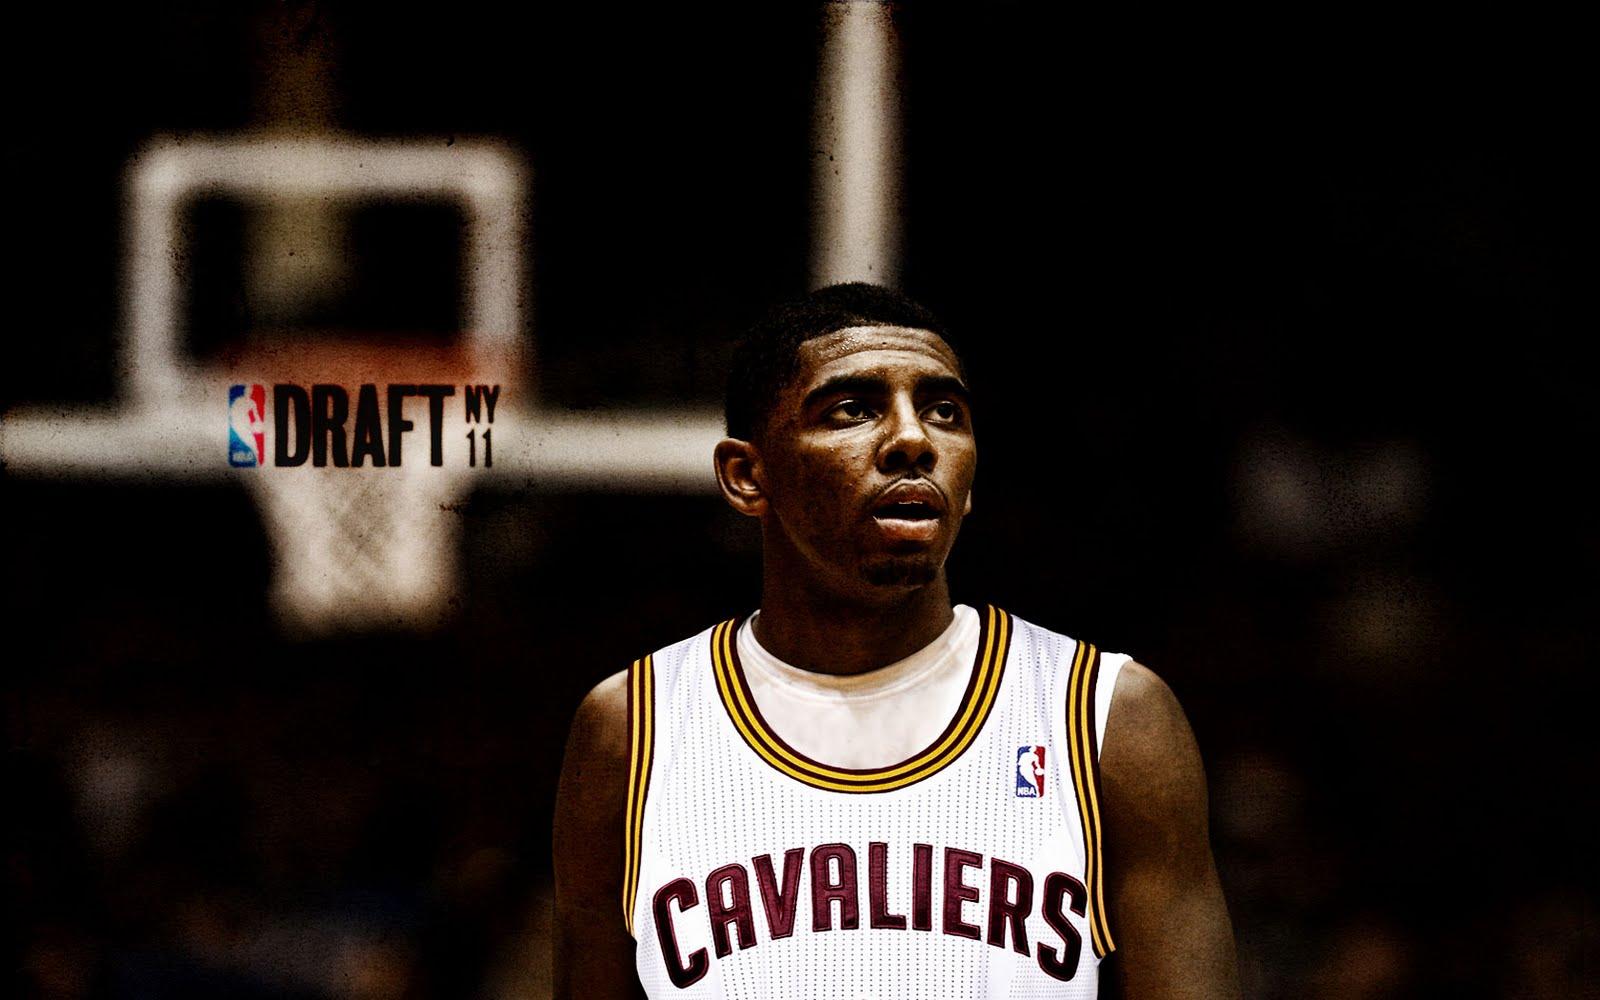 Kyrie Irving Cavs 2011 Draft Pick Widescreen Wallpaper ...